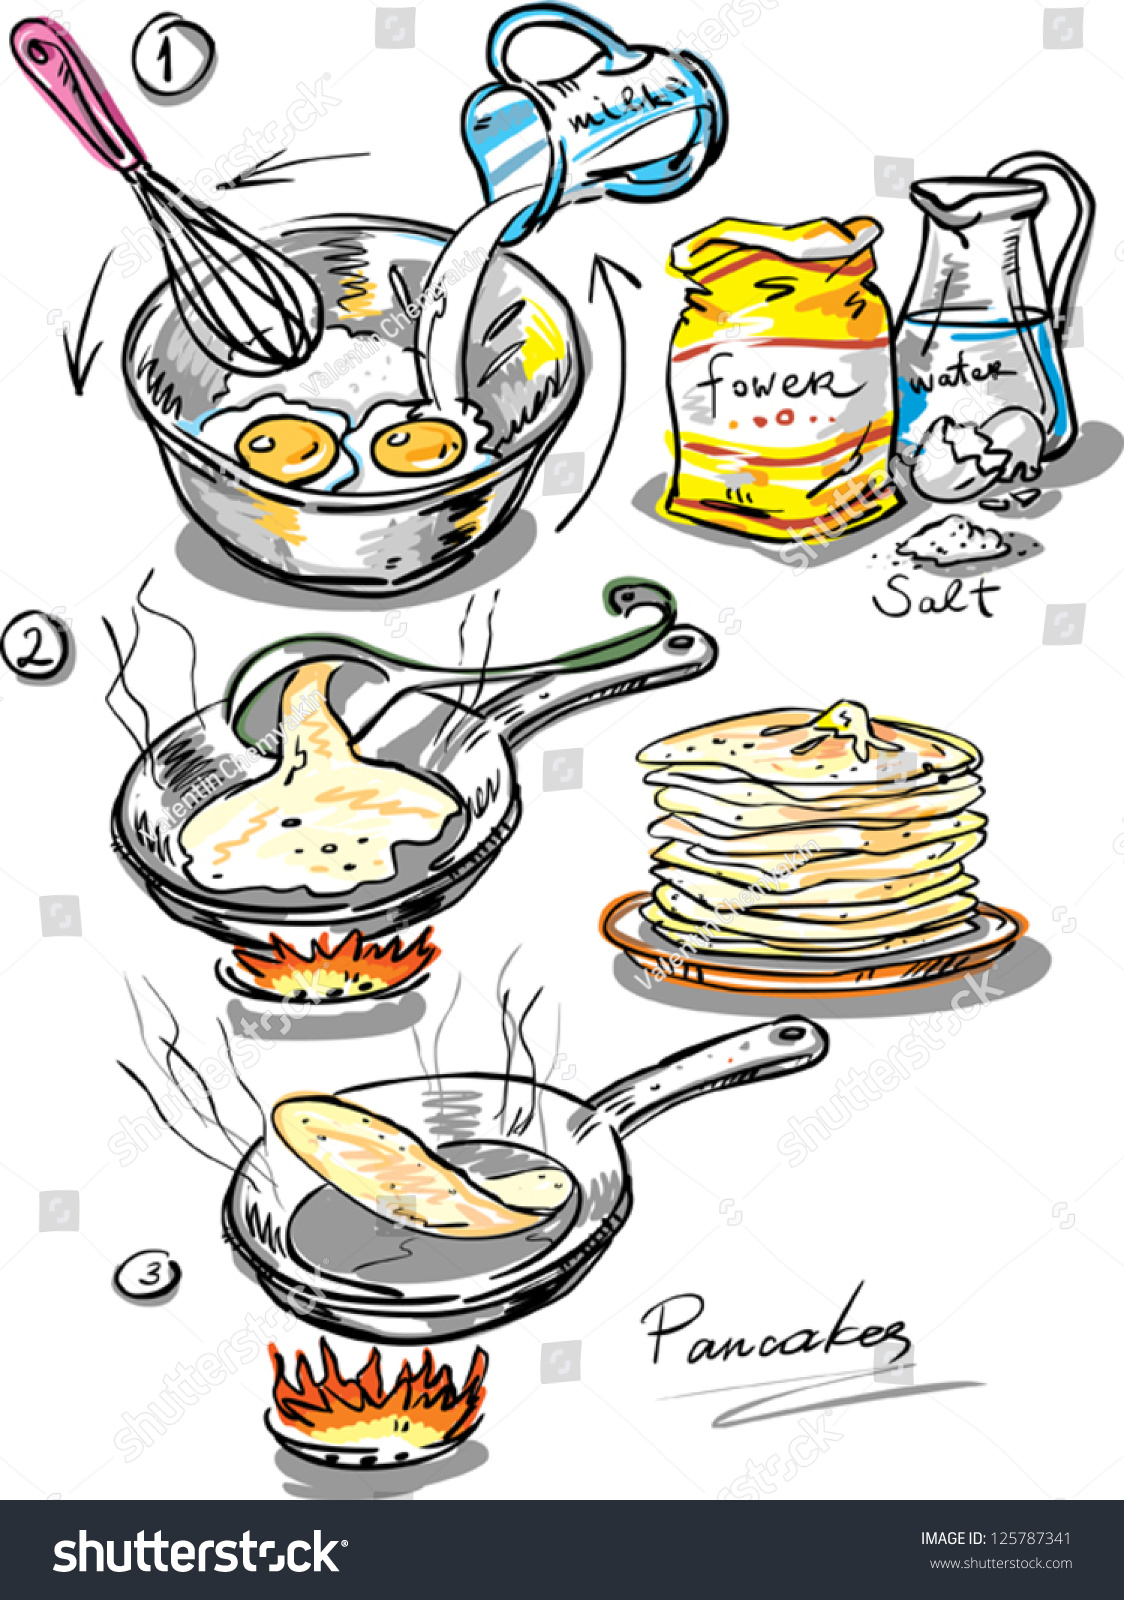 Cooking Pancakes Clip Art